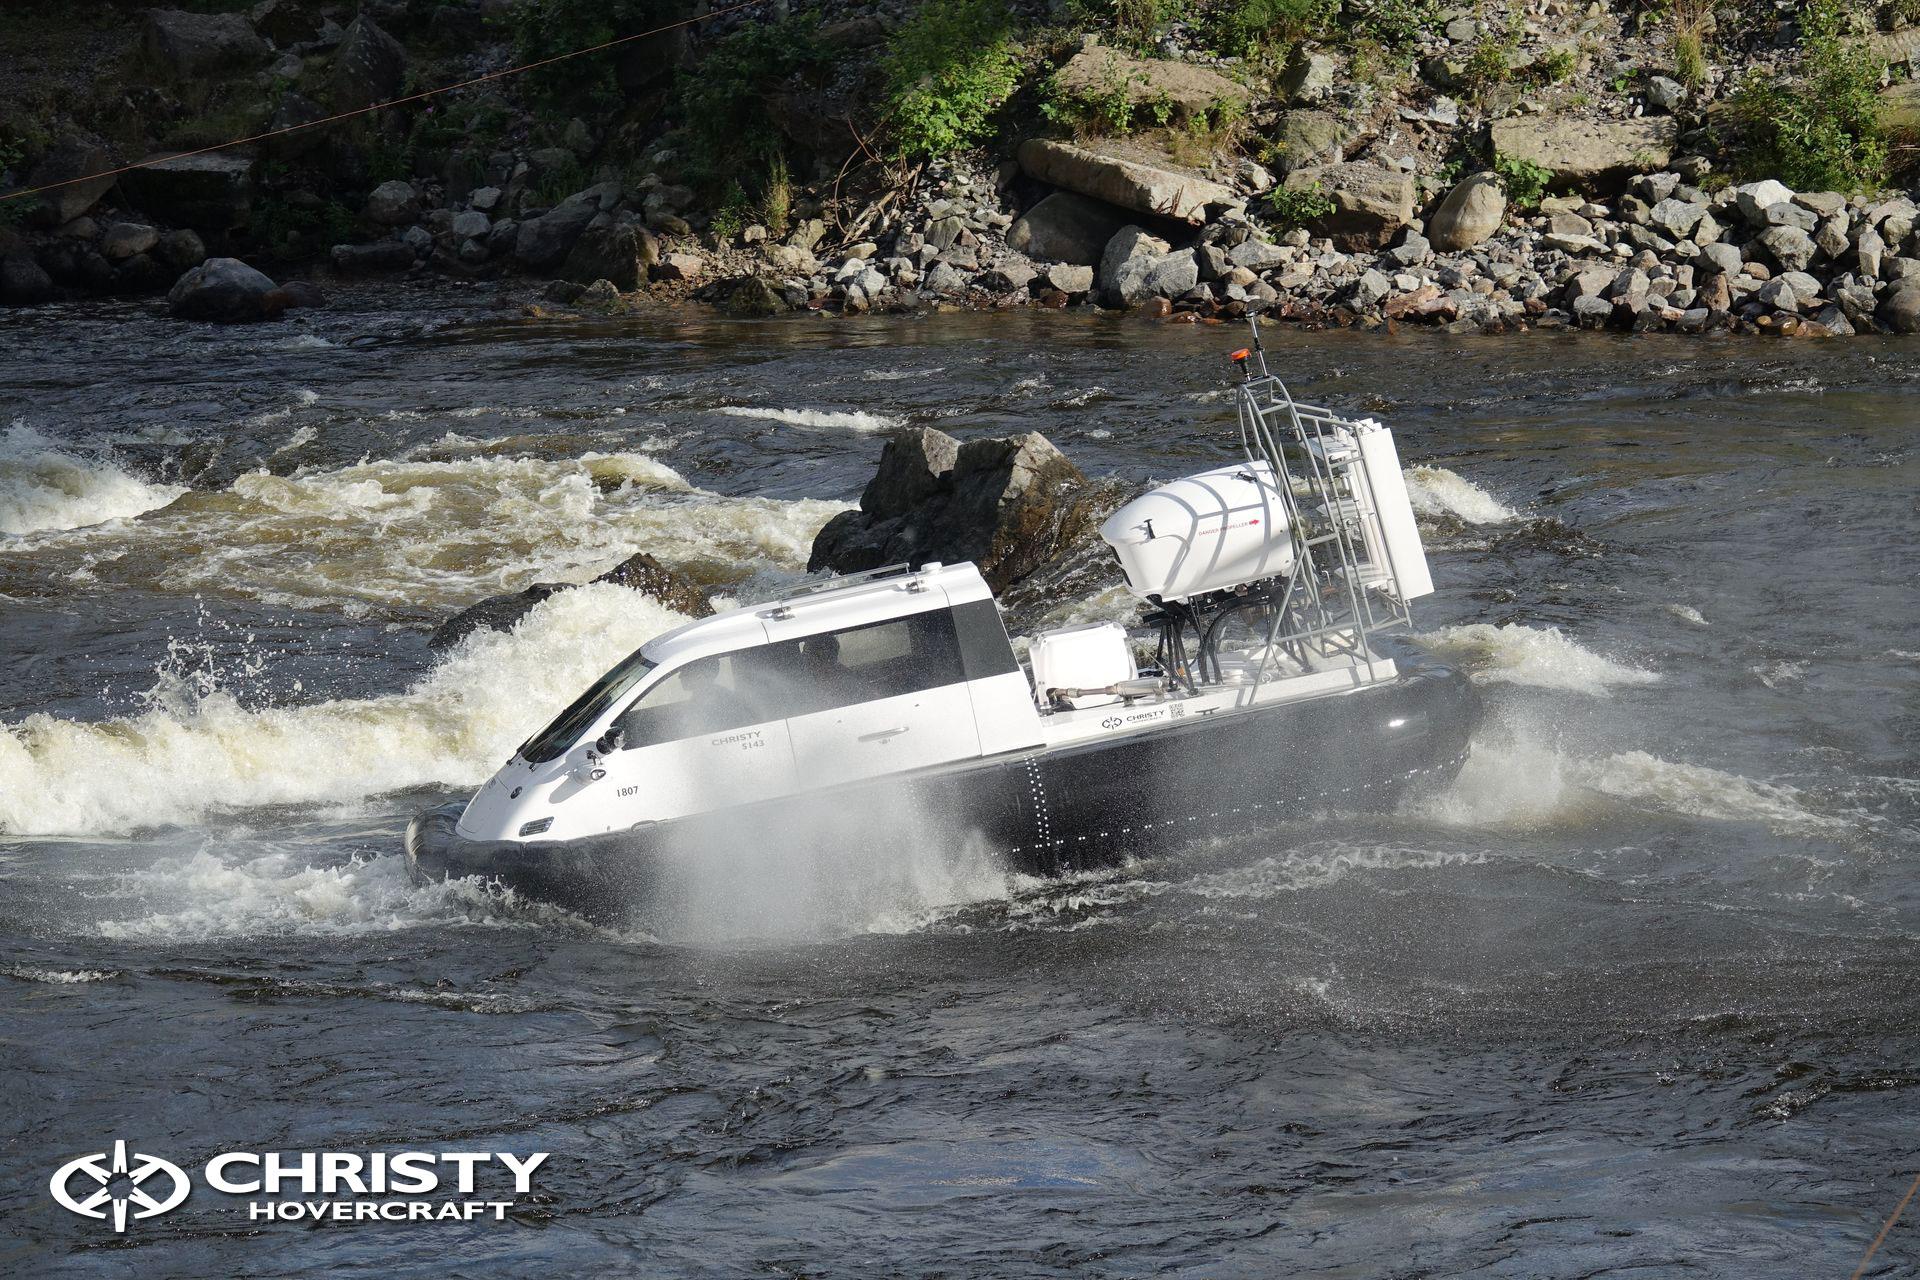 Hovercraft-Christy-5146-FC-28.jpg | фото №26